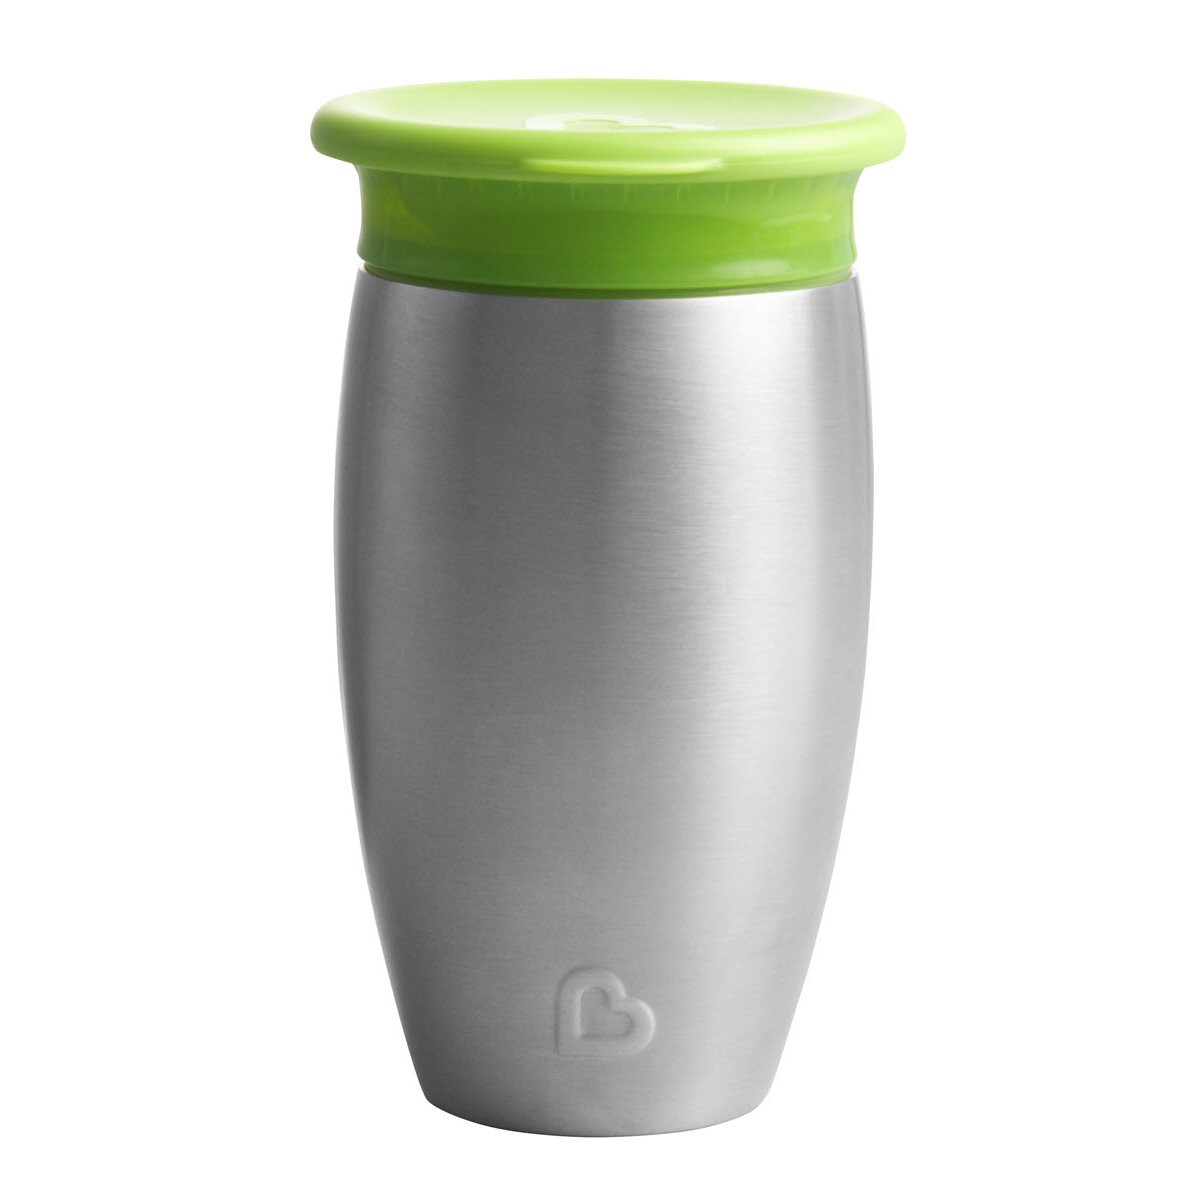 Copo Termico Inox 360 Verde - Munchkin